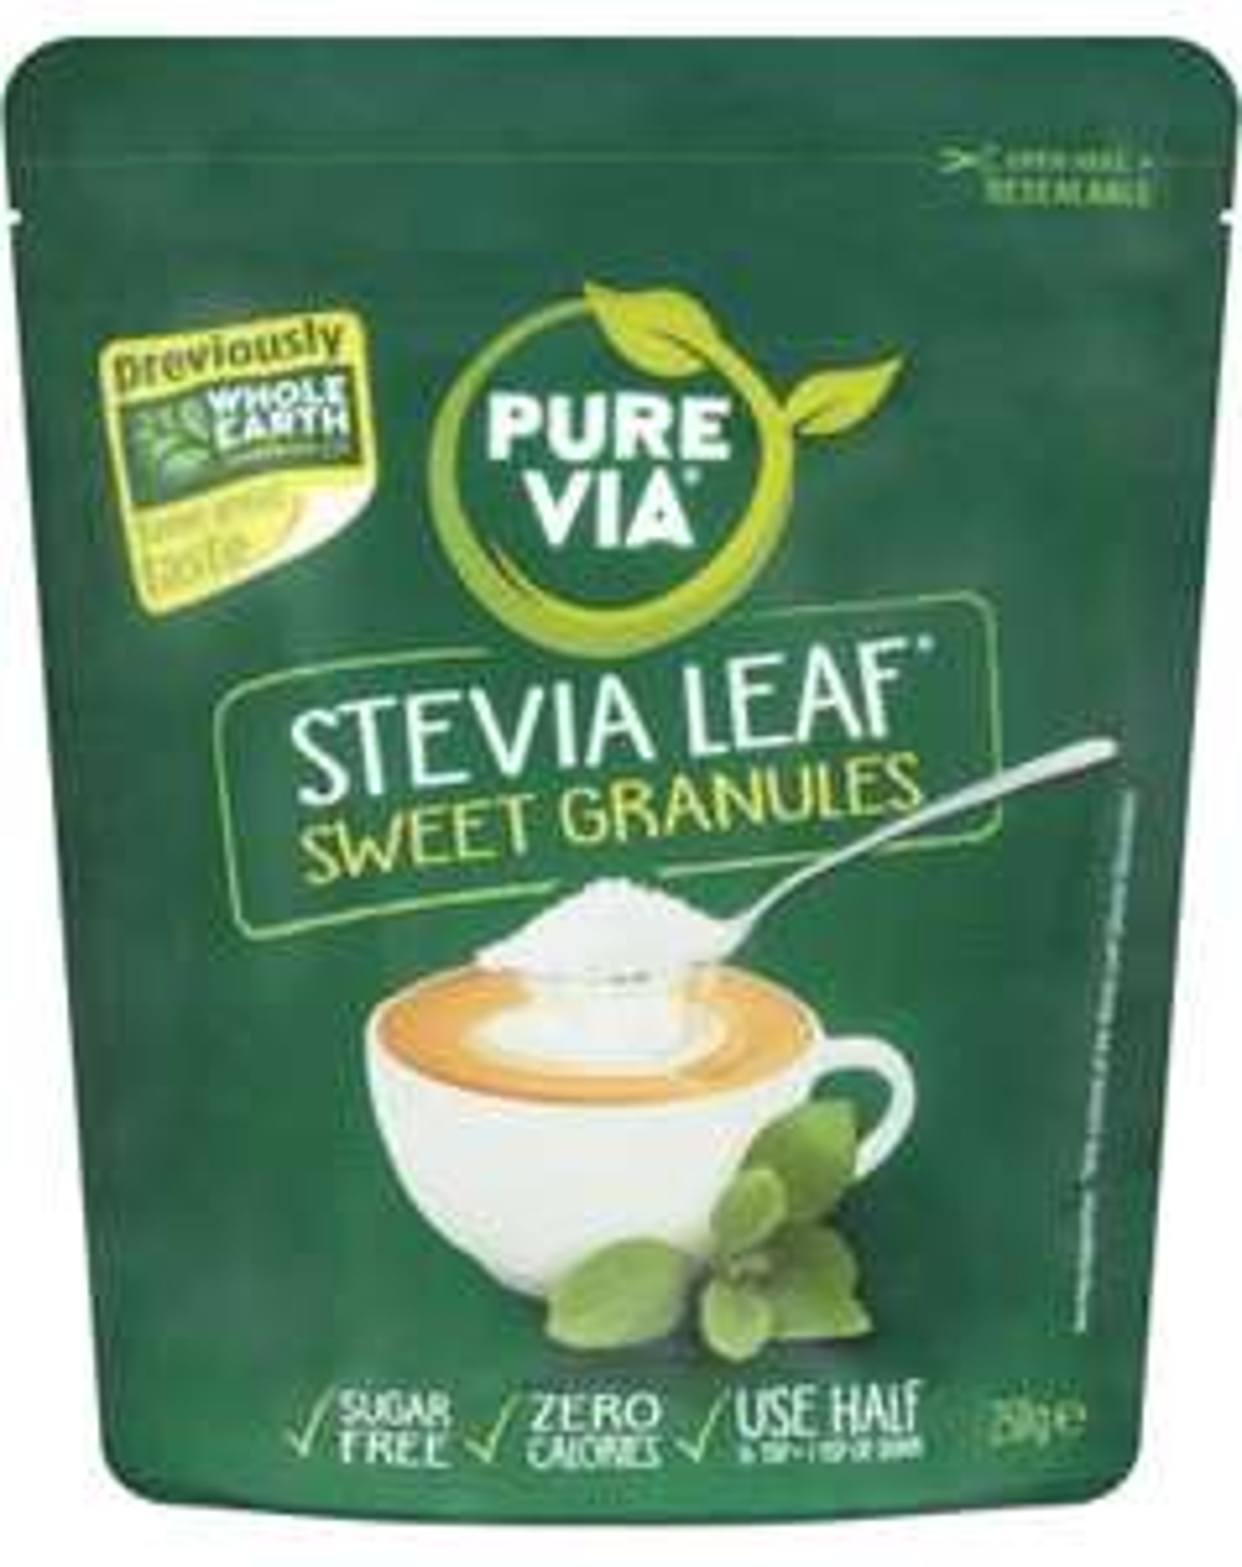 Pure Via Stevia Leaf Sweet Granules 250g £2.10 Sainsbury's